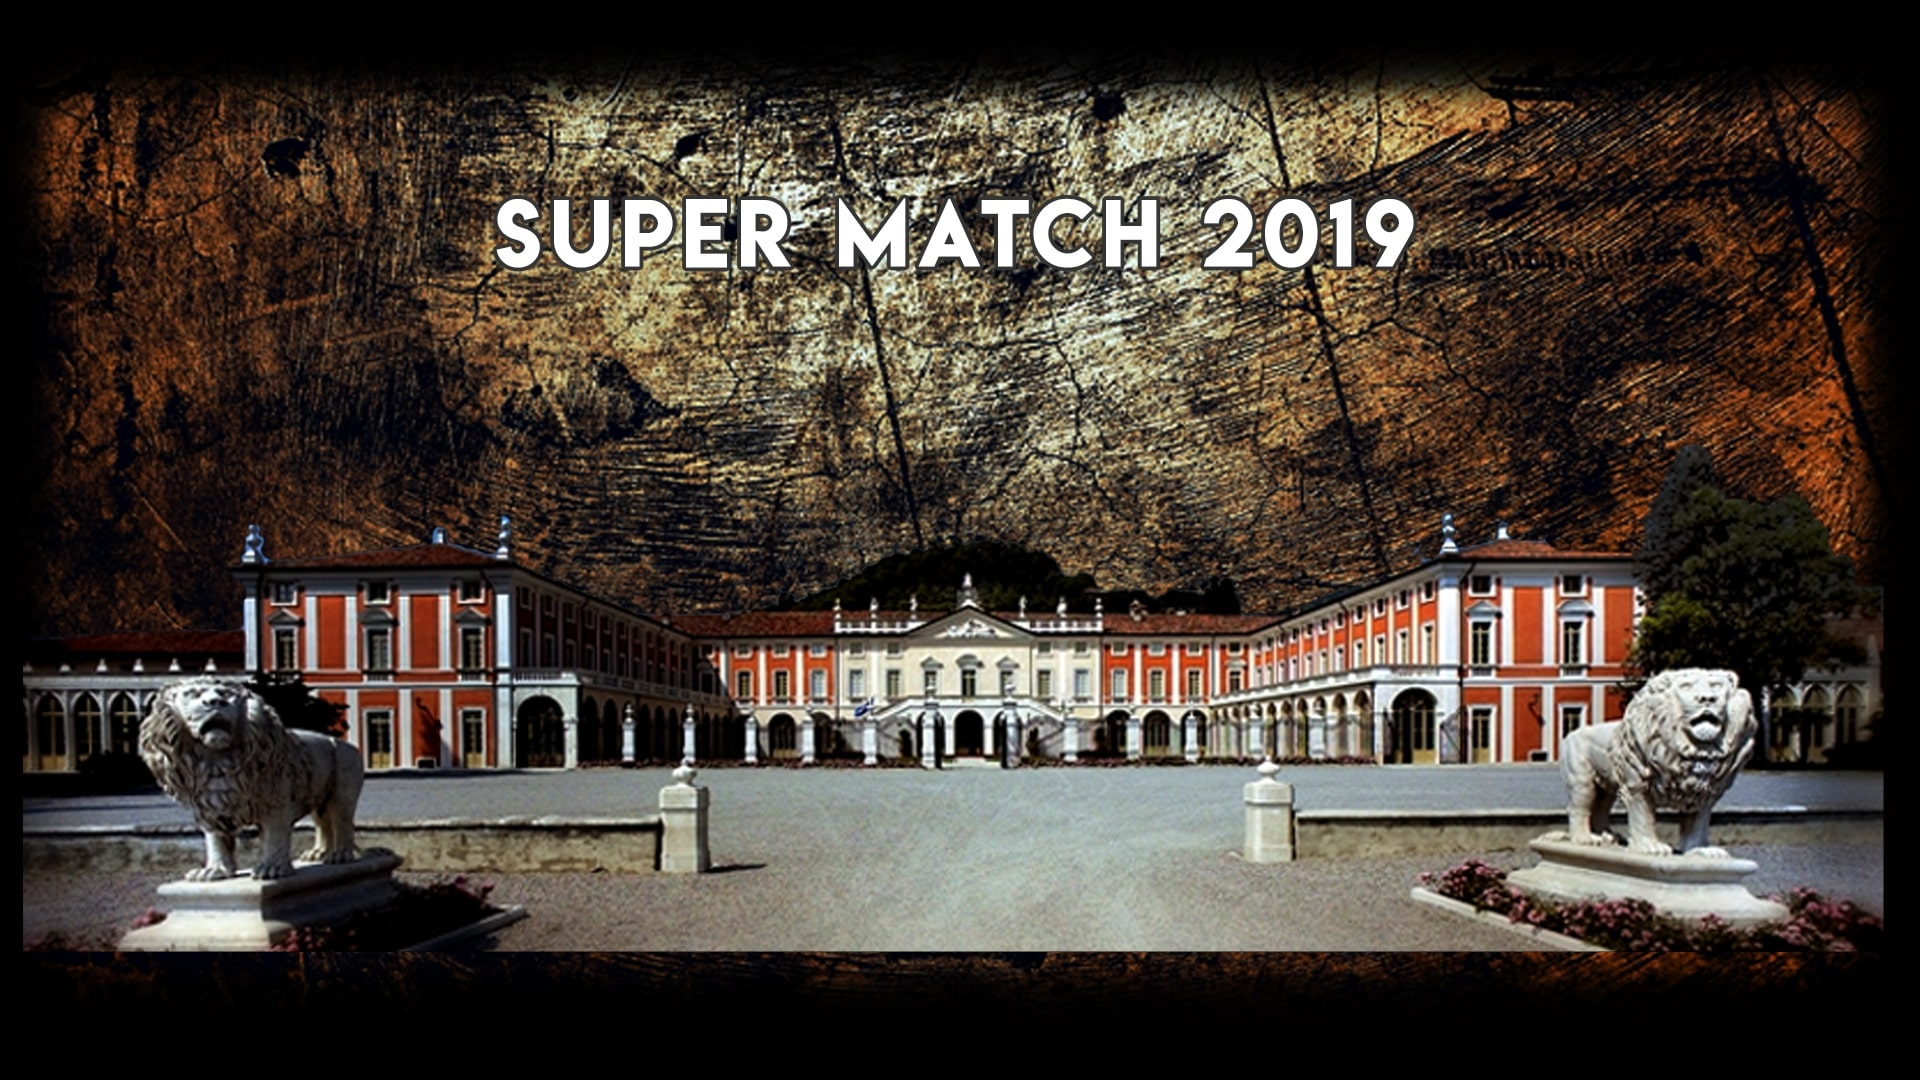 SBFI - Supermatch 2019